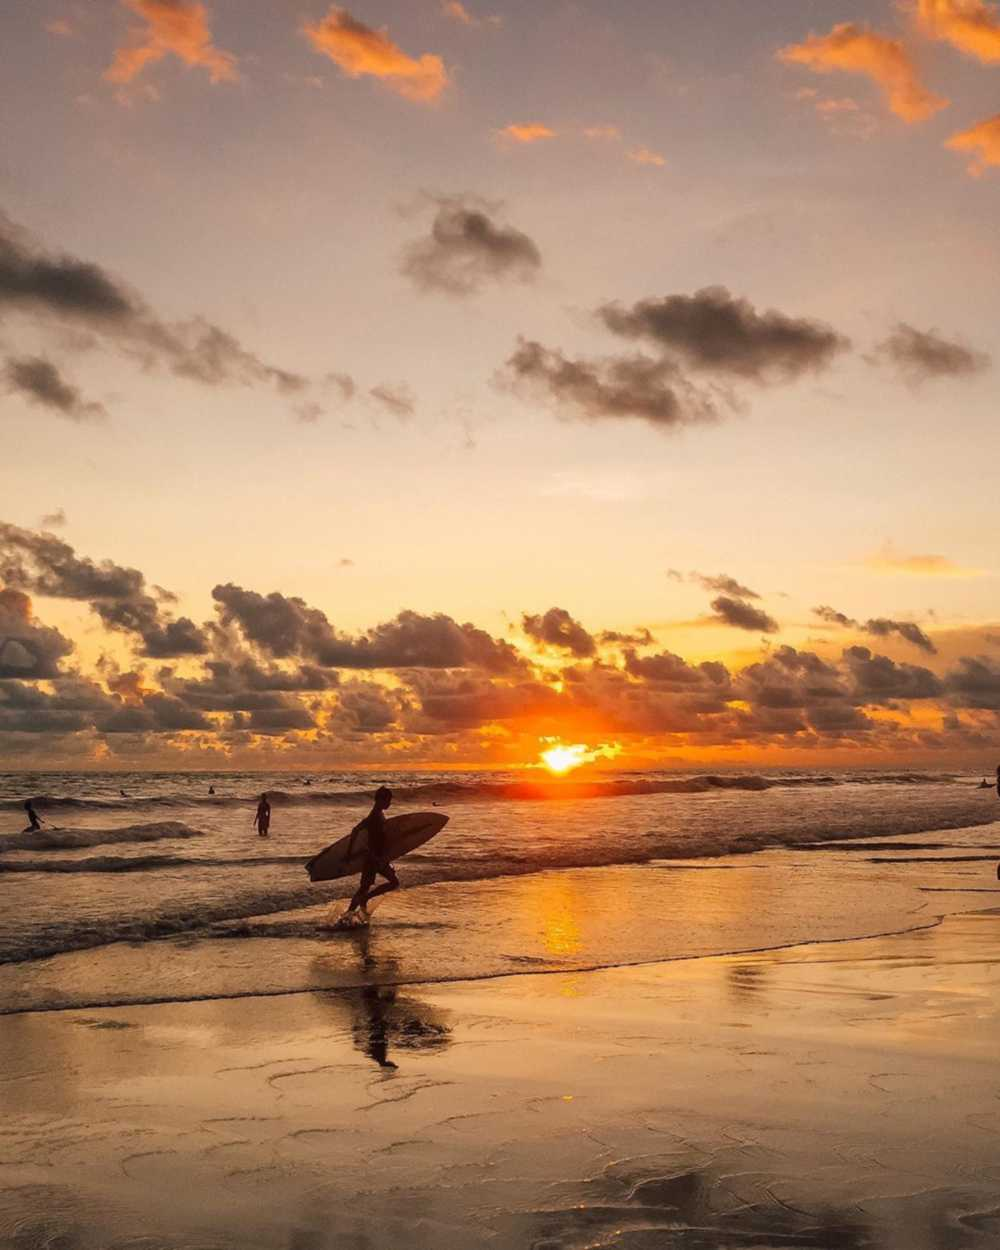 Sunset pantai echo